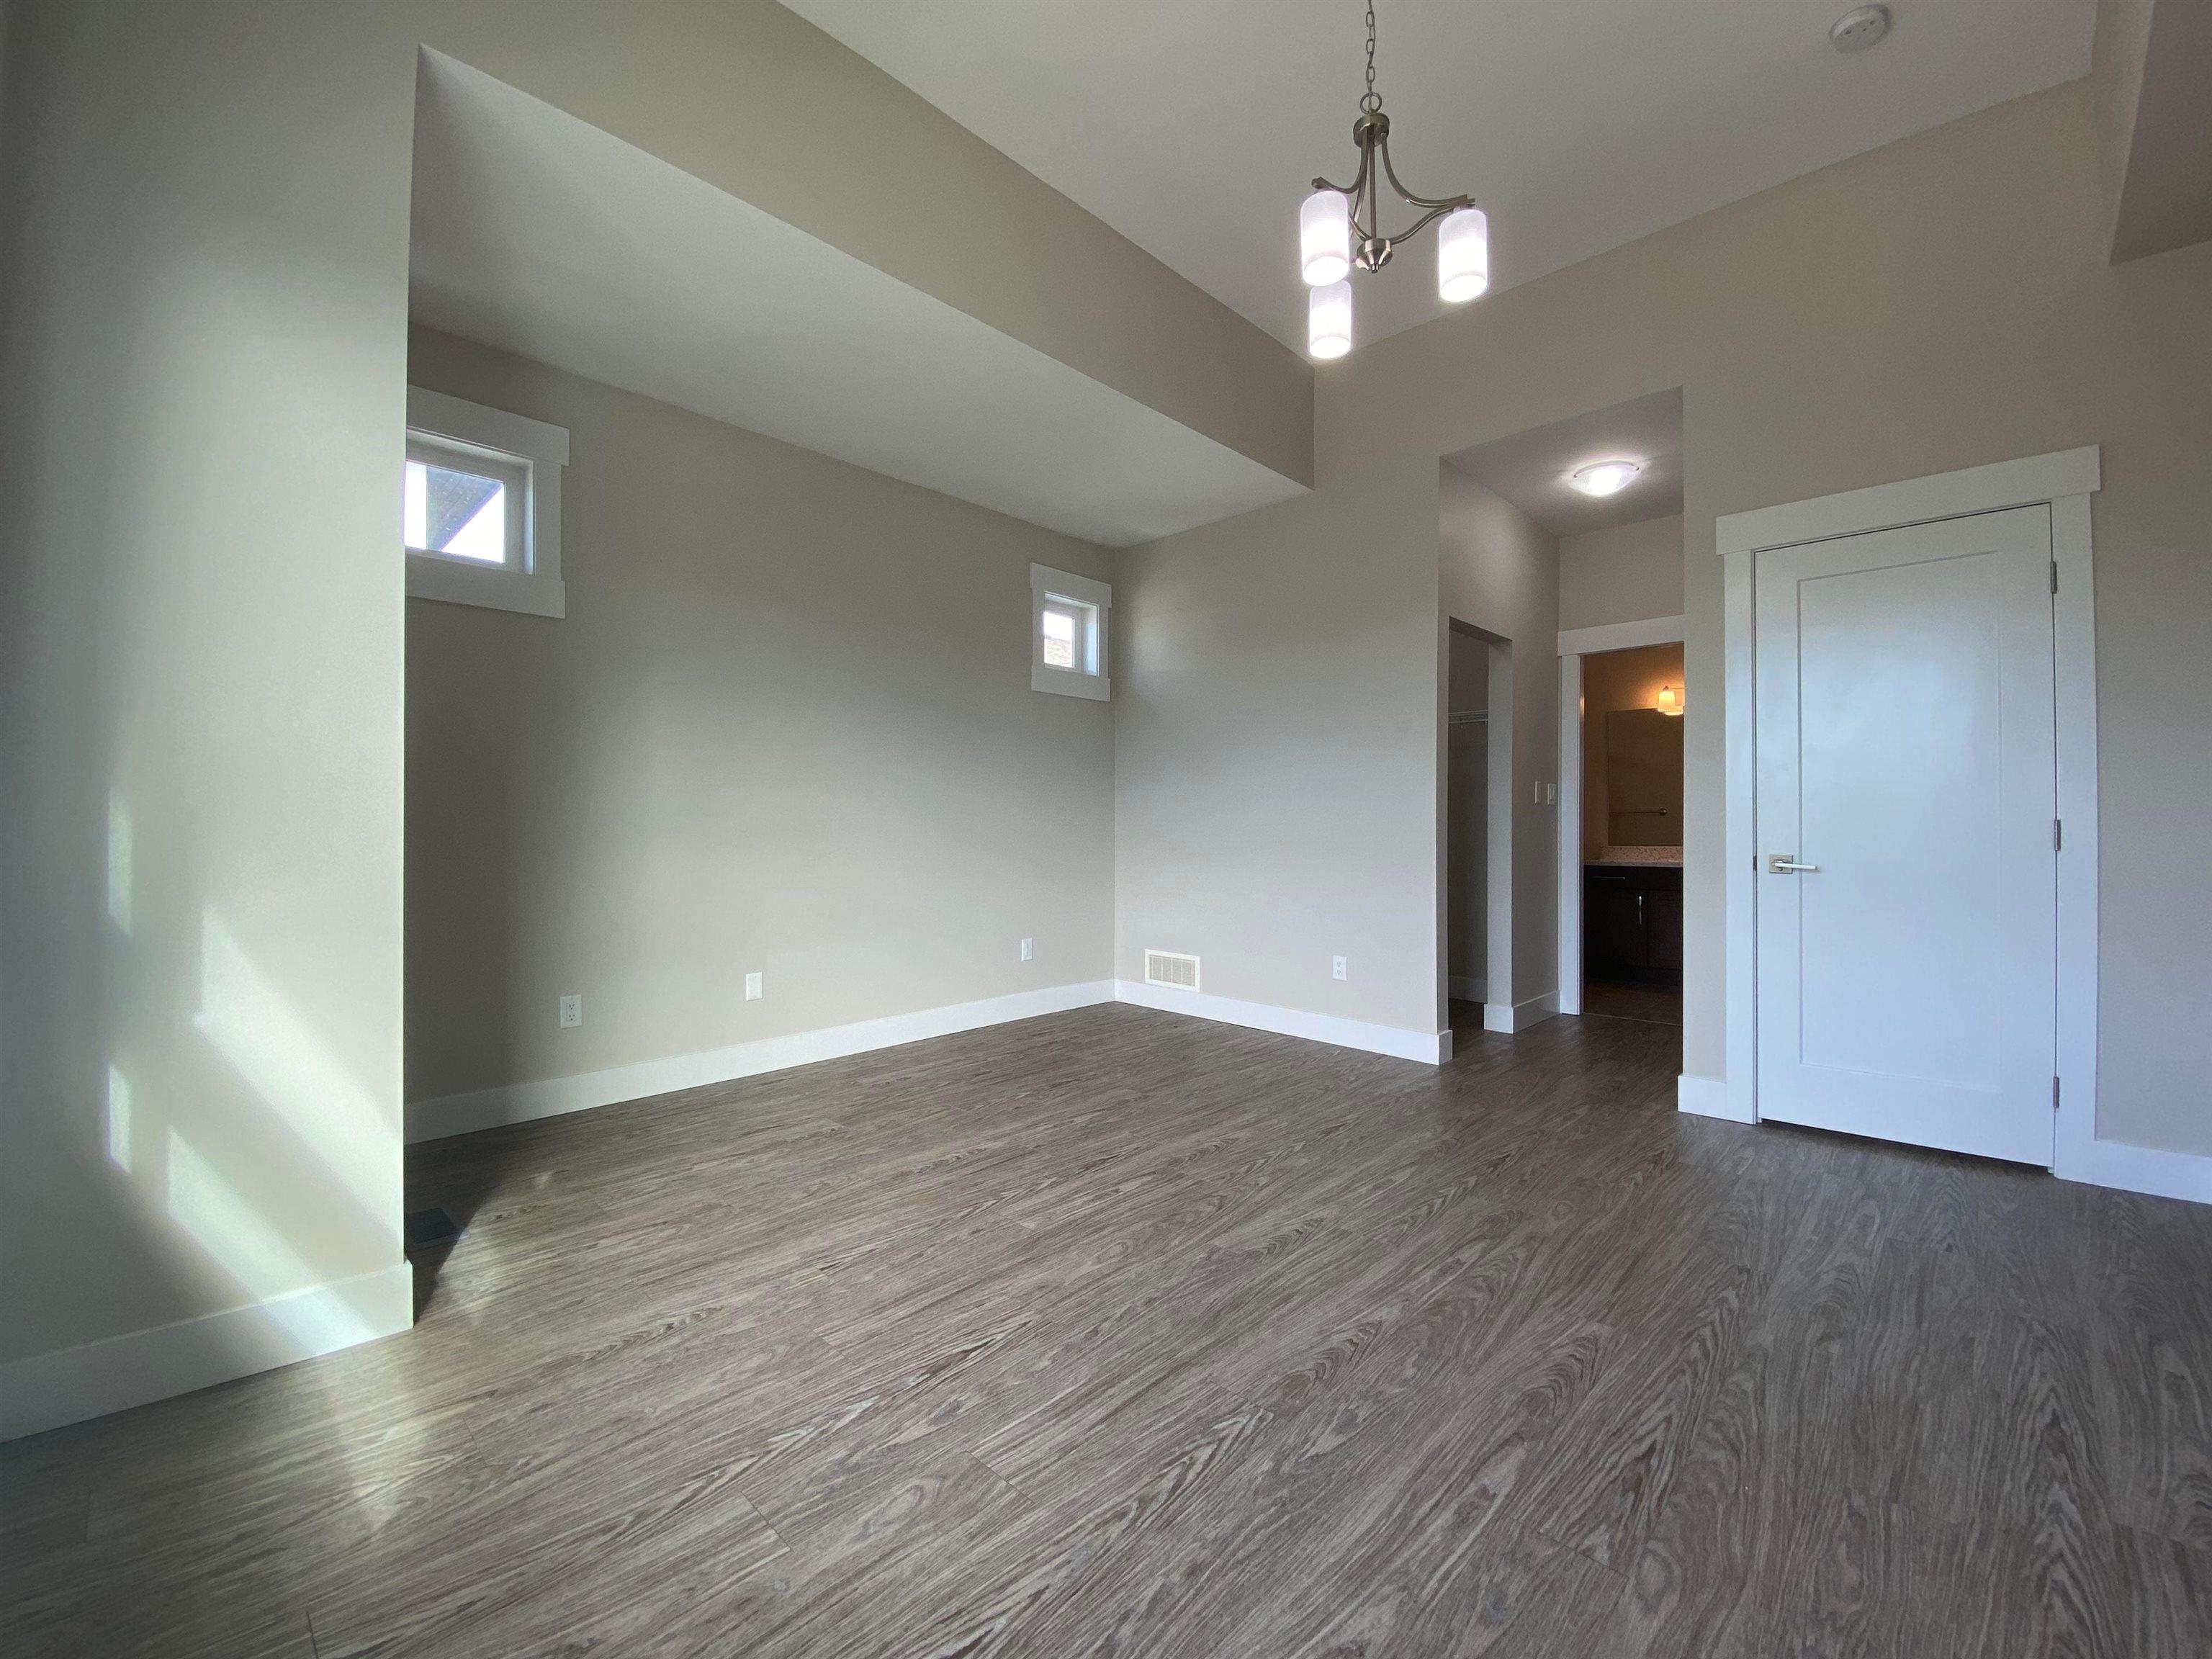 10144 KILLARNEY DRIVE - Fairfield Island House/Single Family for sale, 5 Bedrooms (R2625716) - #23